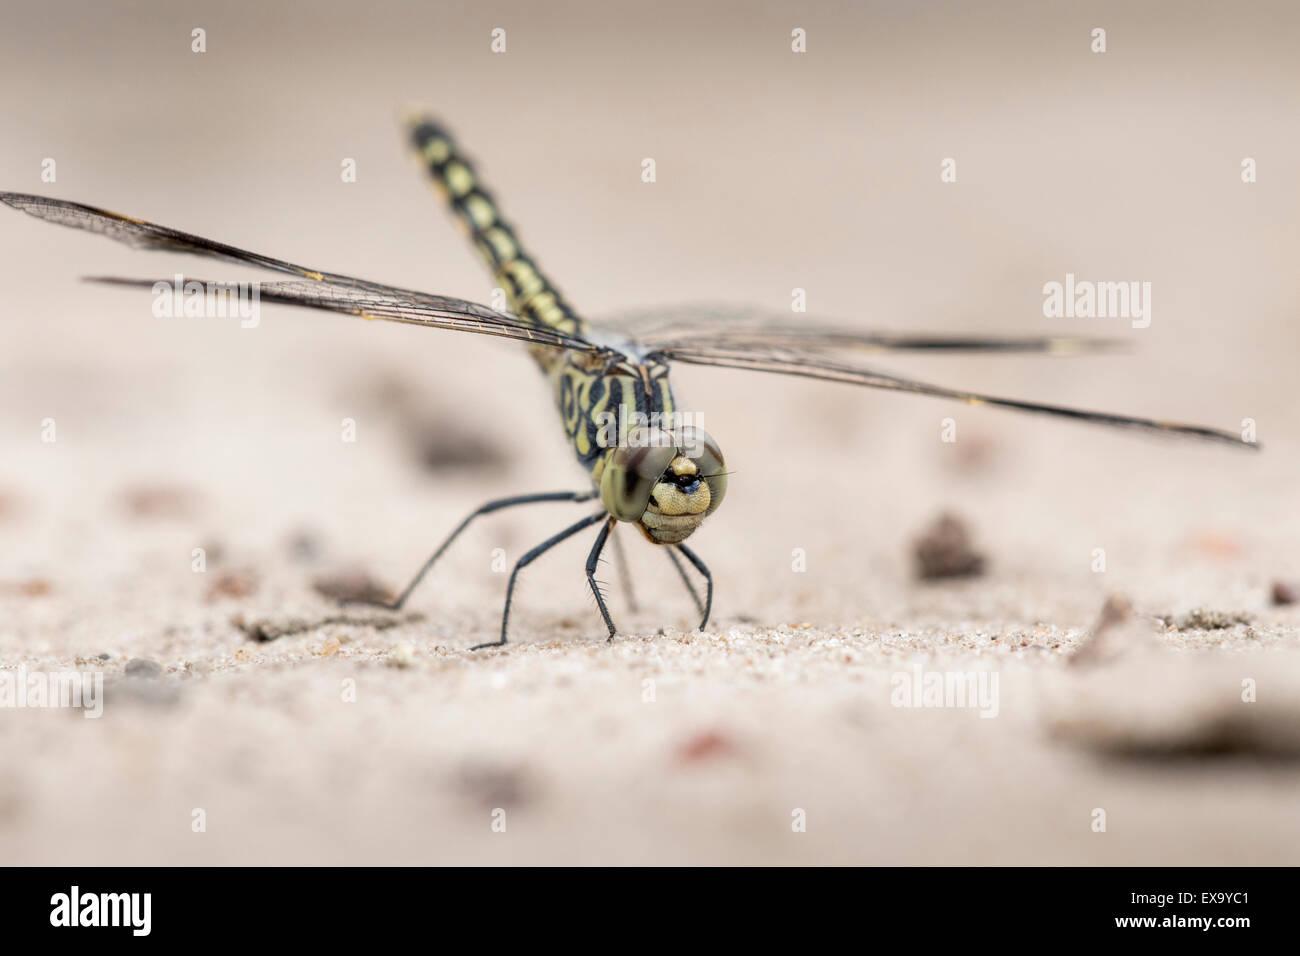 Africa, Botswana, Chobe National Park, Macro view of dragonfly in sand along Chobe River Stock Photo